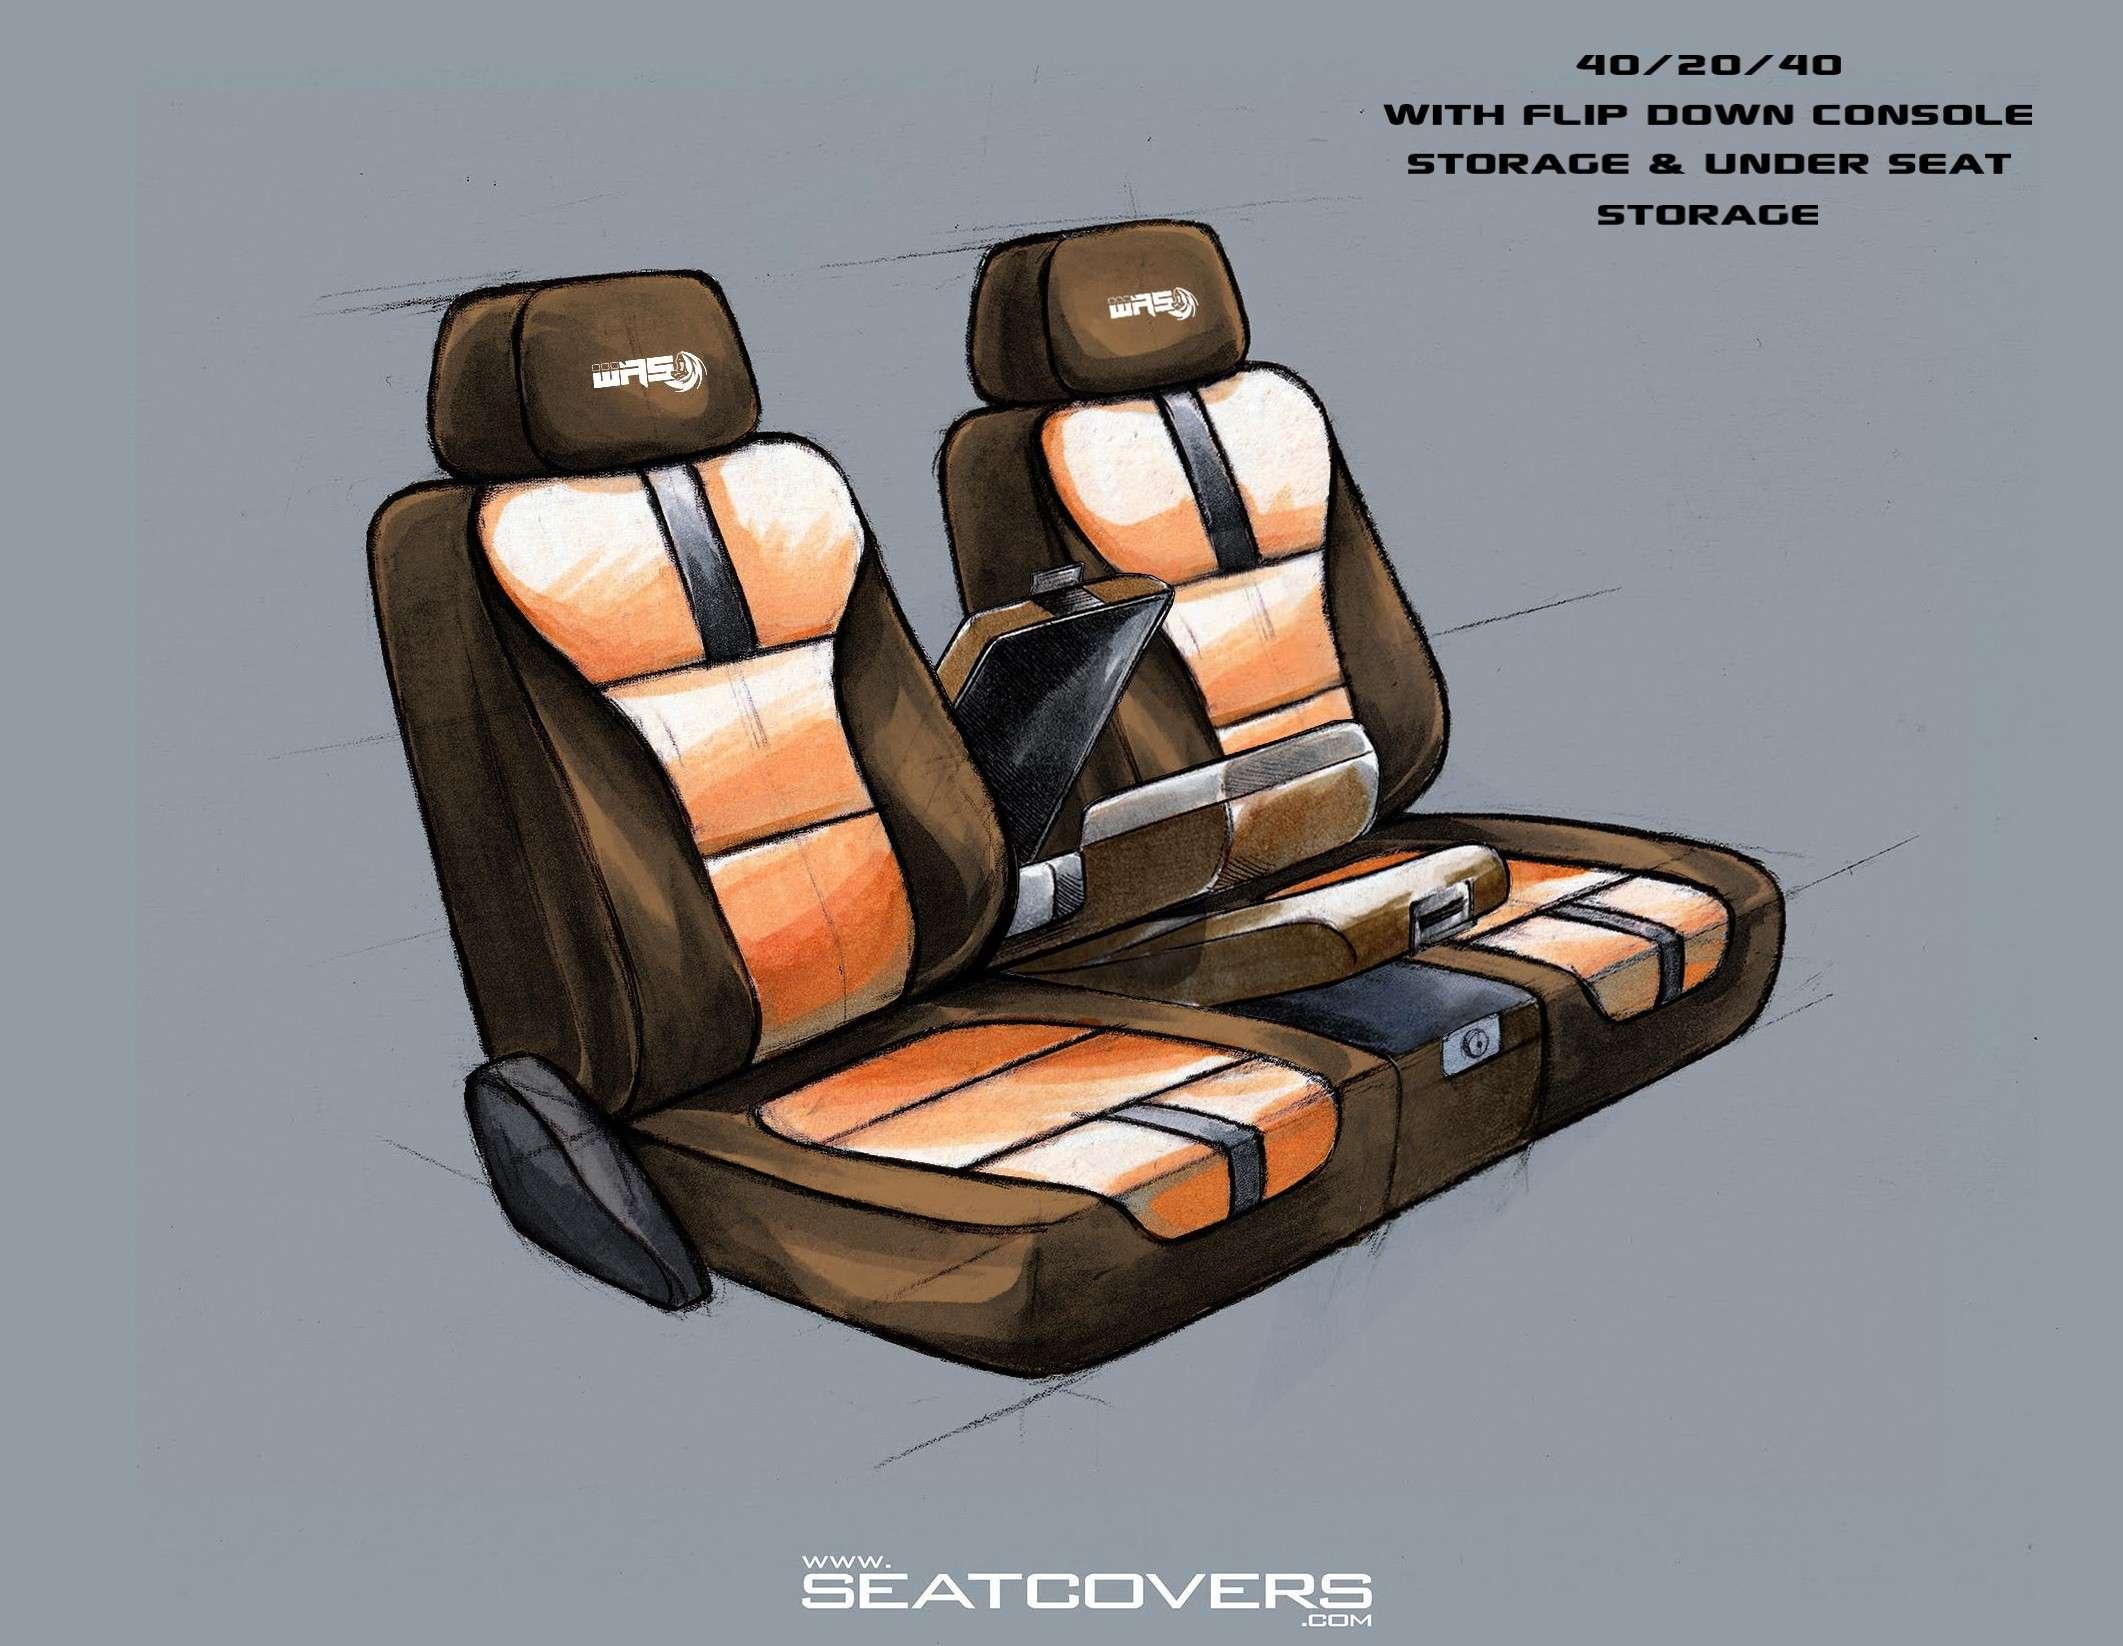 2014-2018 SIERRA SILVERADO 1500, 2015-2019 SIERRA SILVERADO HD, 2015-2020 YUKON, TAHOE, SUBURBAN- Front Seat Covers www.seatcovers.com